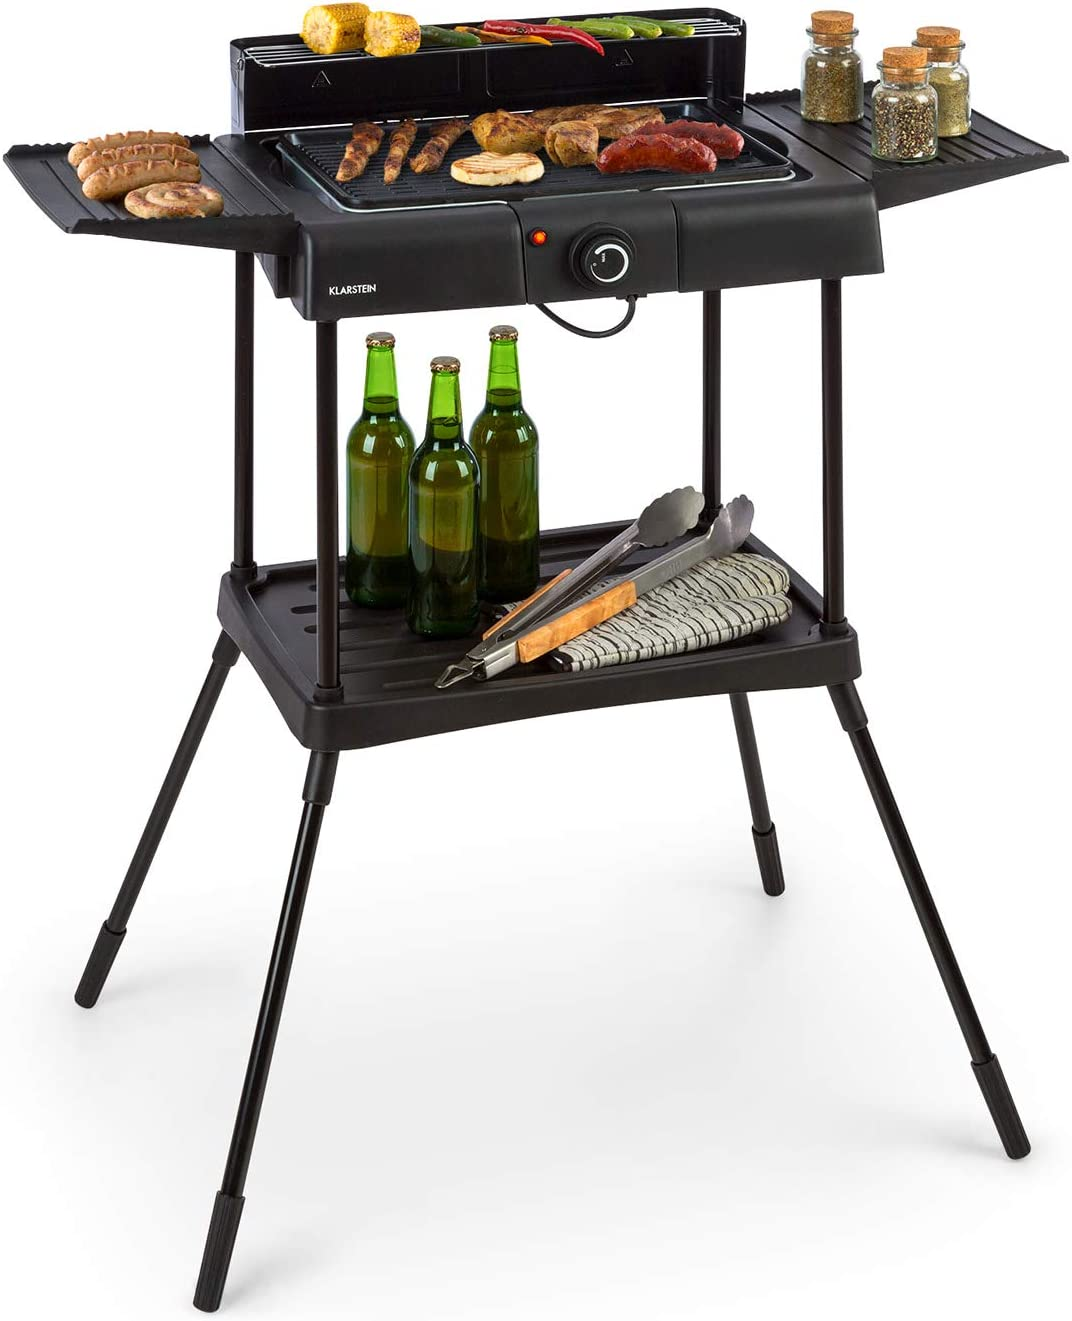 Klarstein Dr. Beef Pro barbacoa eléctrica - 1700-2000 W de potencia, concepto EasyGrill, superficie de aluminio antiadherente de 41 x 26 cm, dos mesas laterales, negro